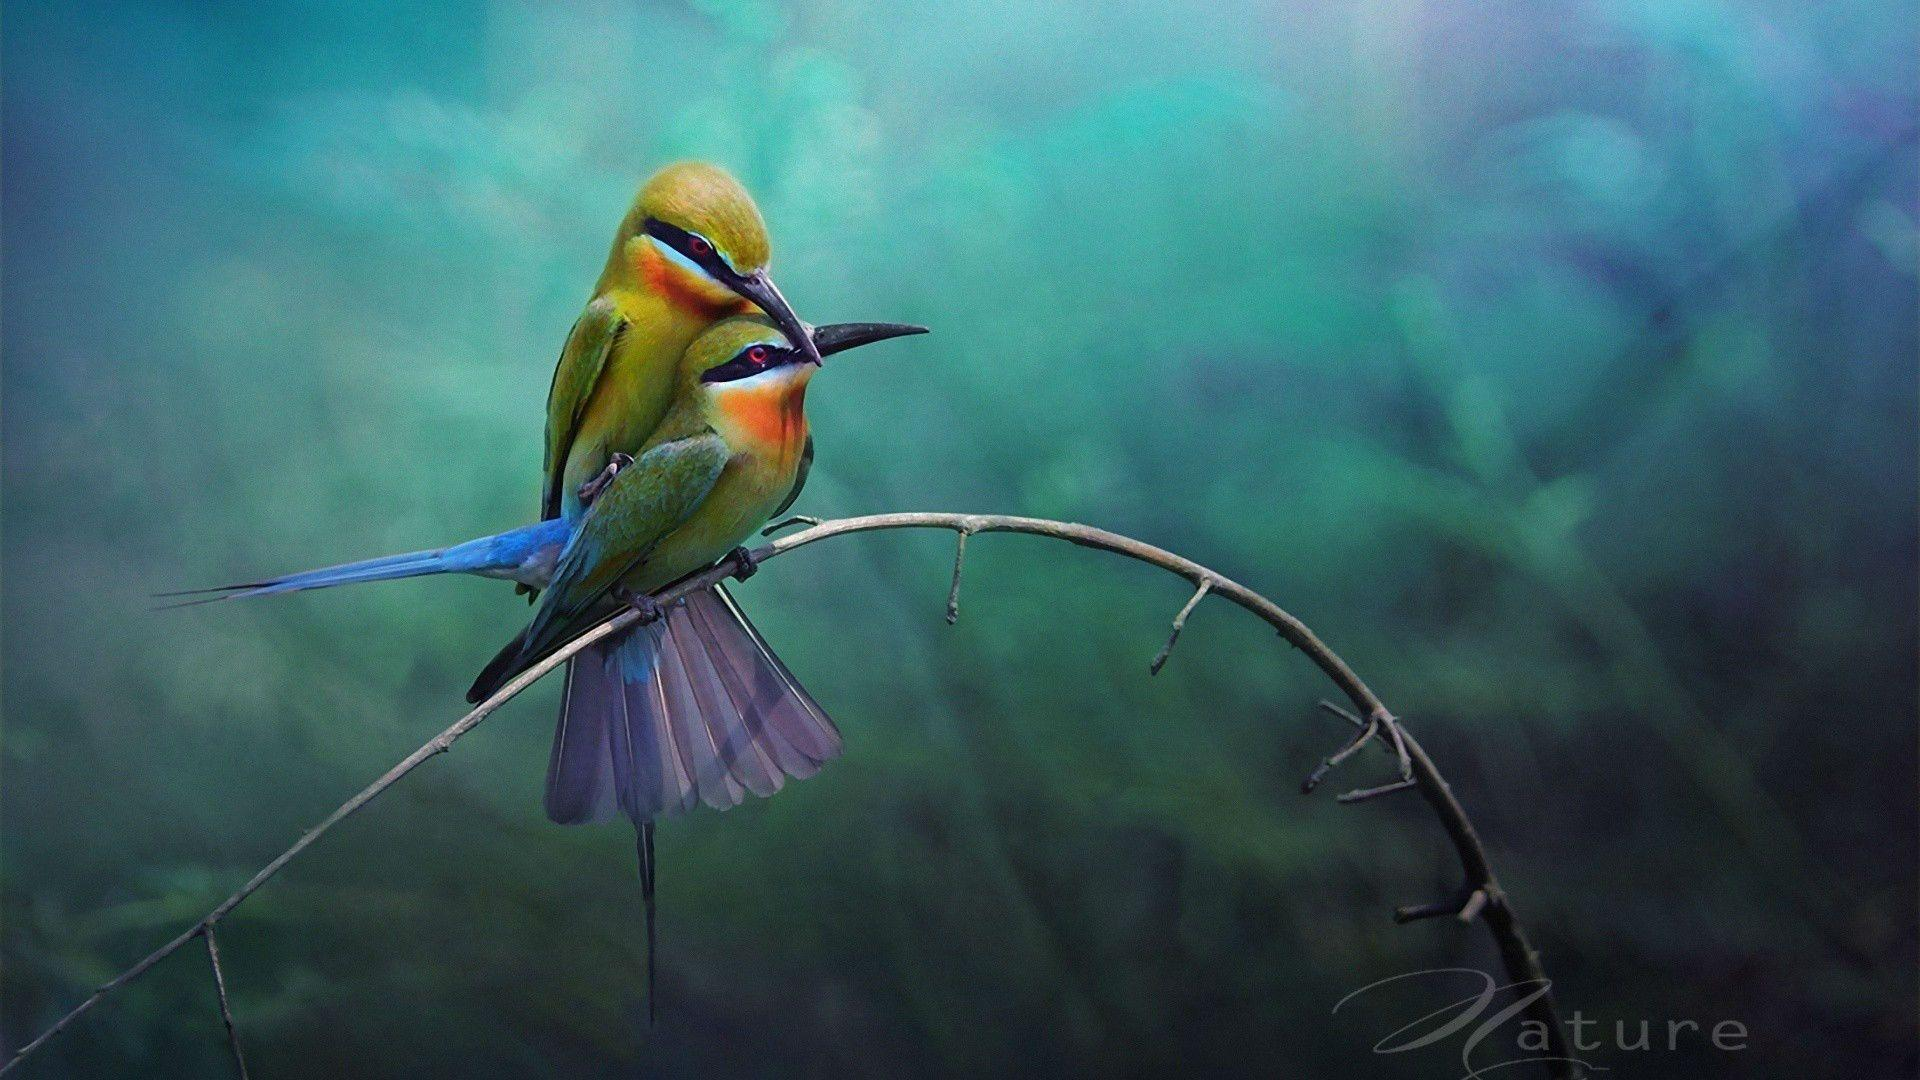 Love Birds Hd Wallpapers Wallpaper Cave